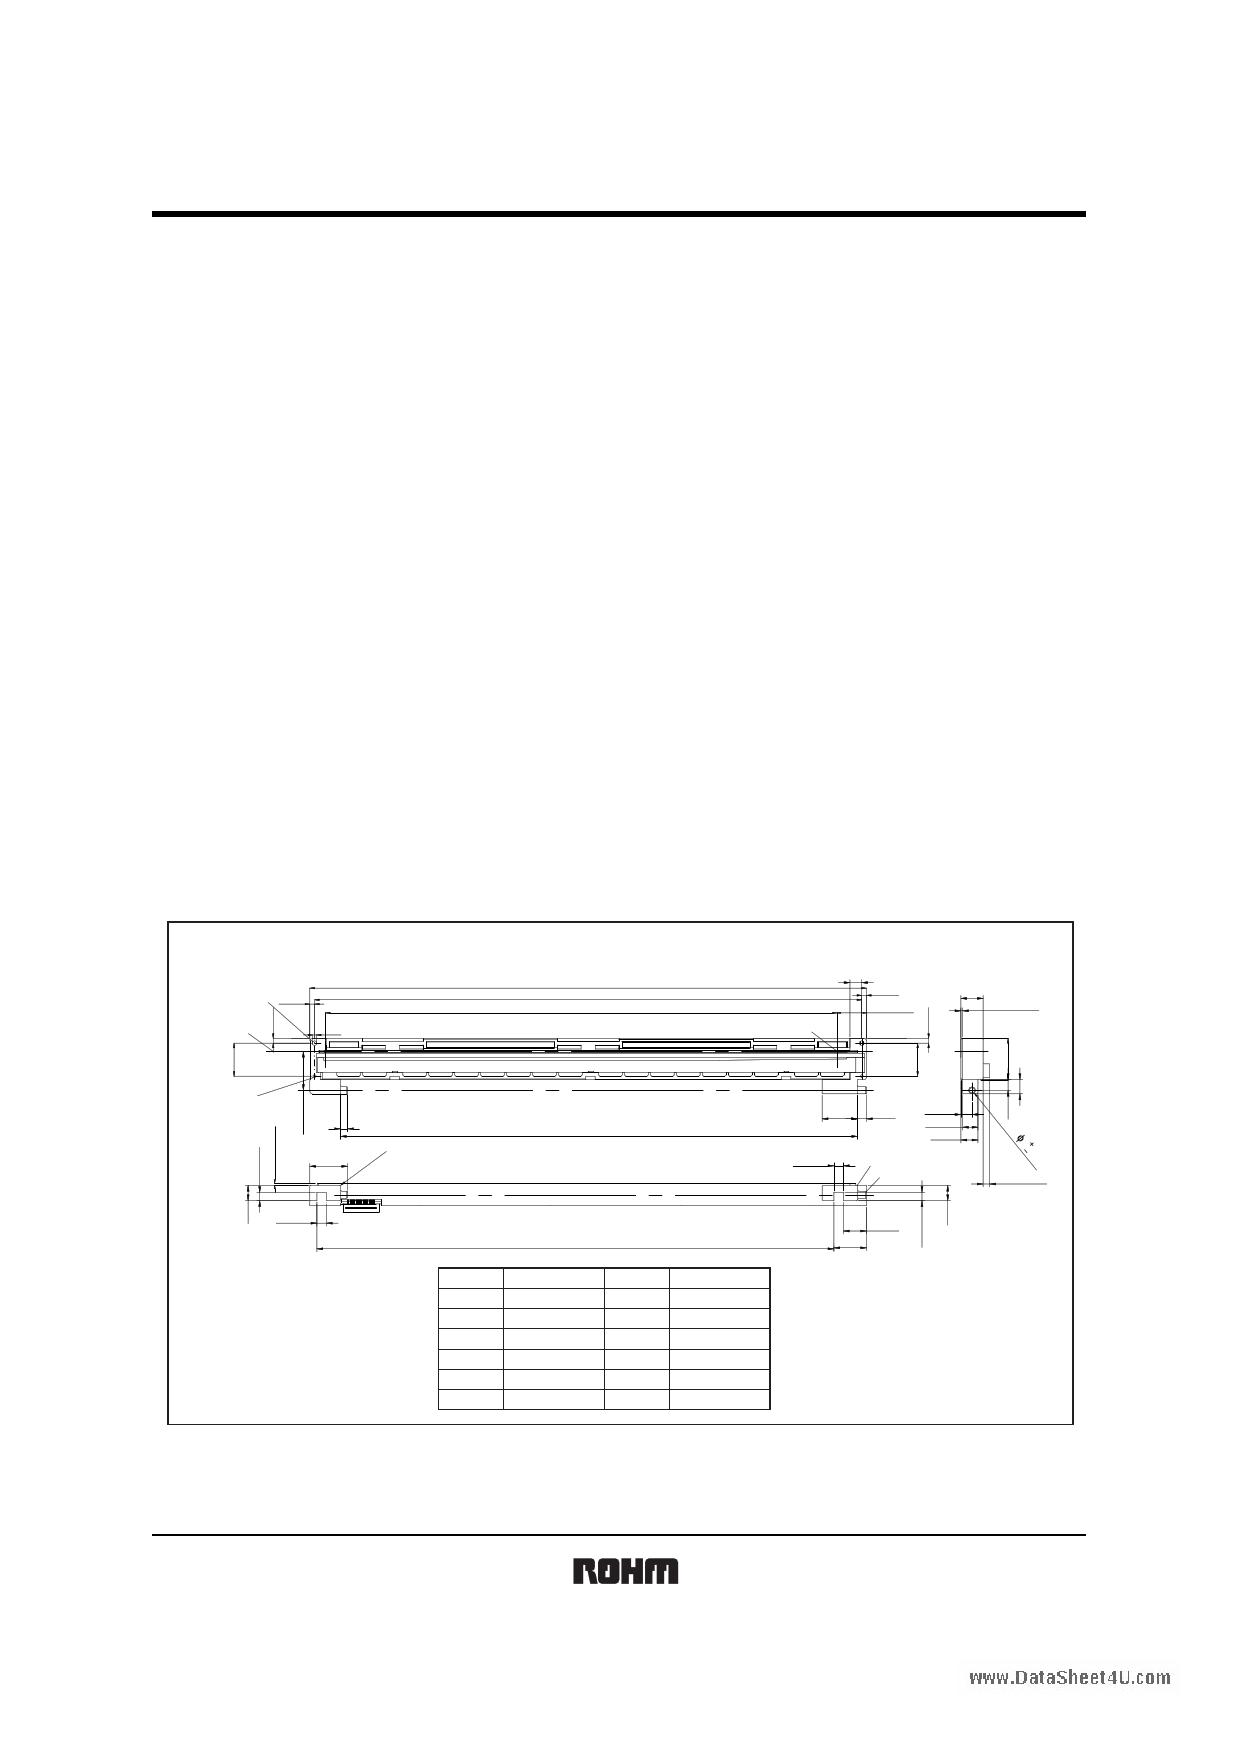 IA1208-FB11A دیتاشیت PDF